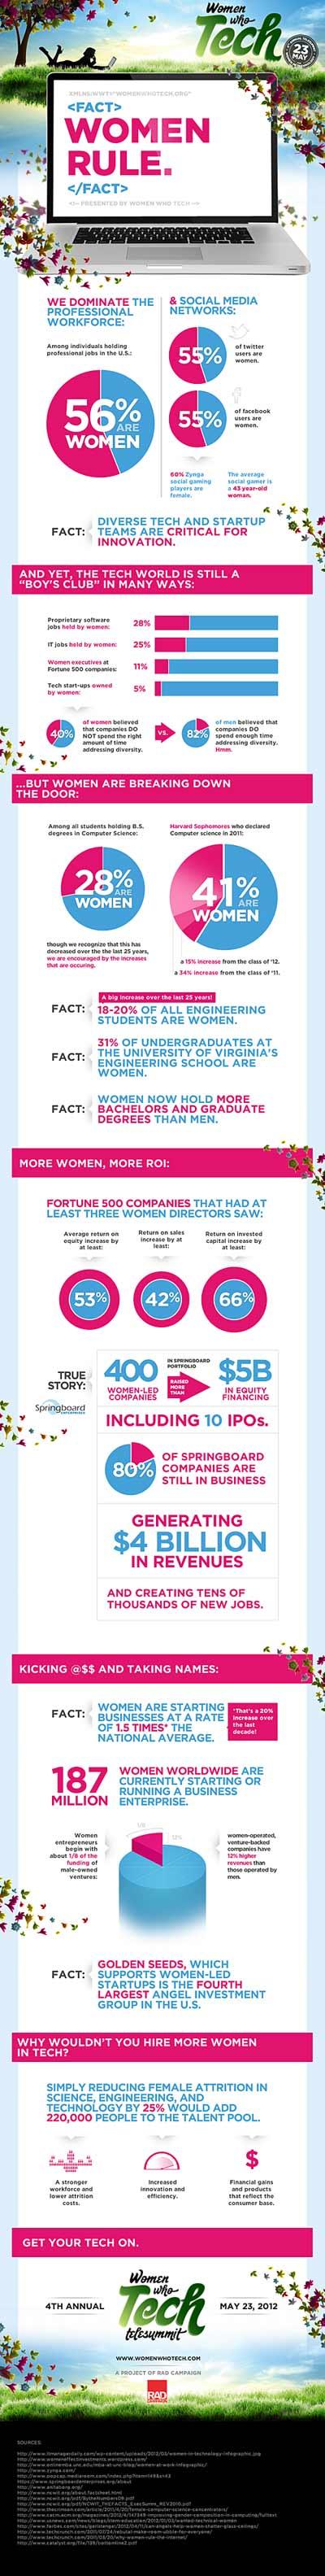 Women Who Tech Infographic